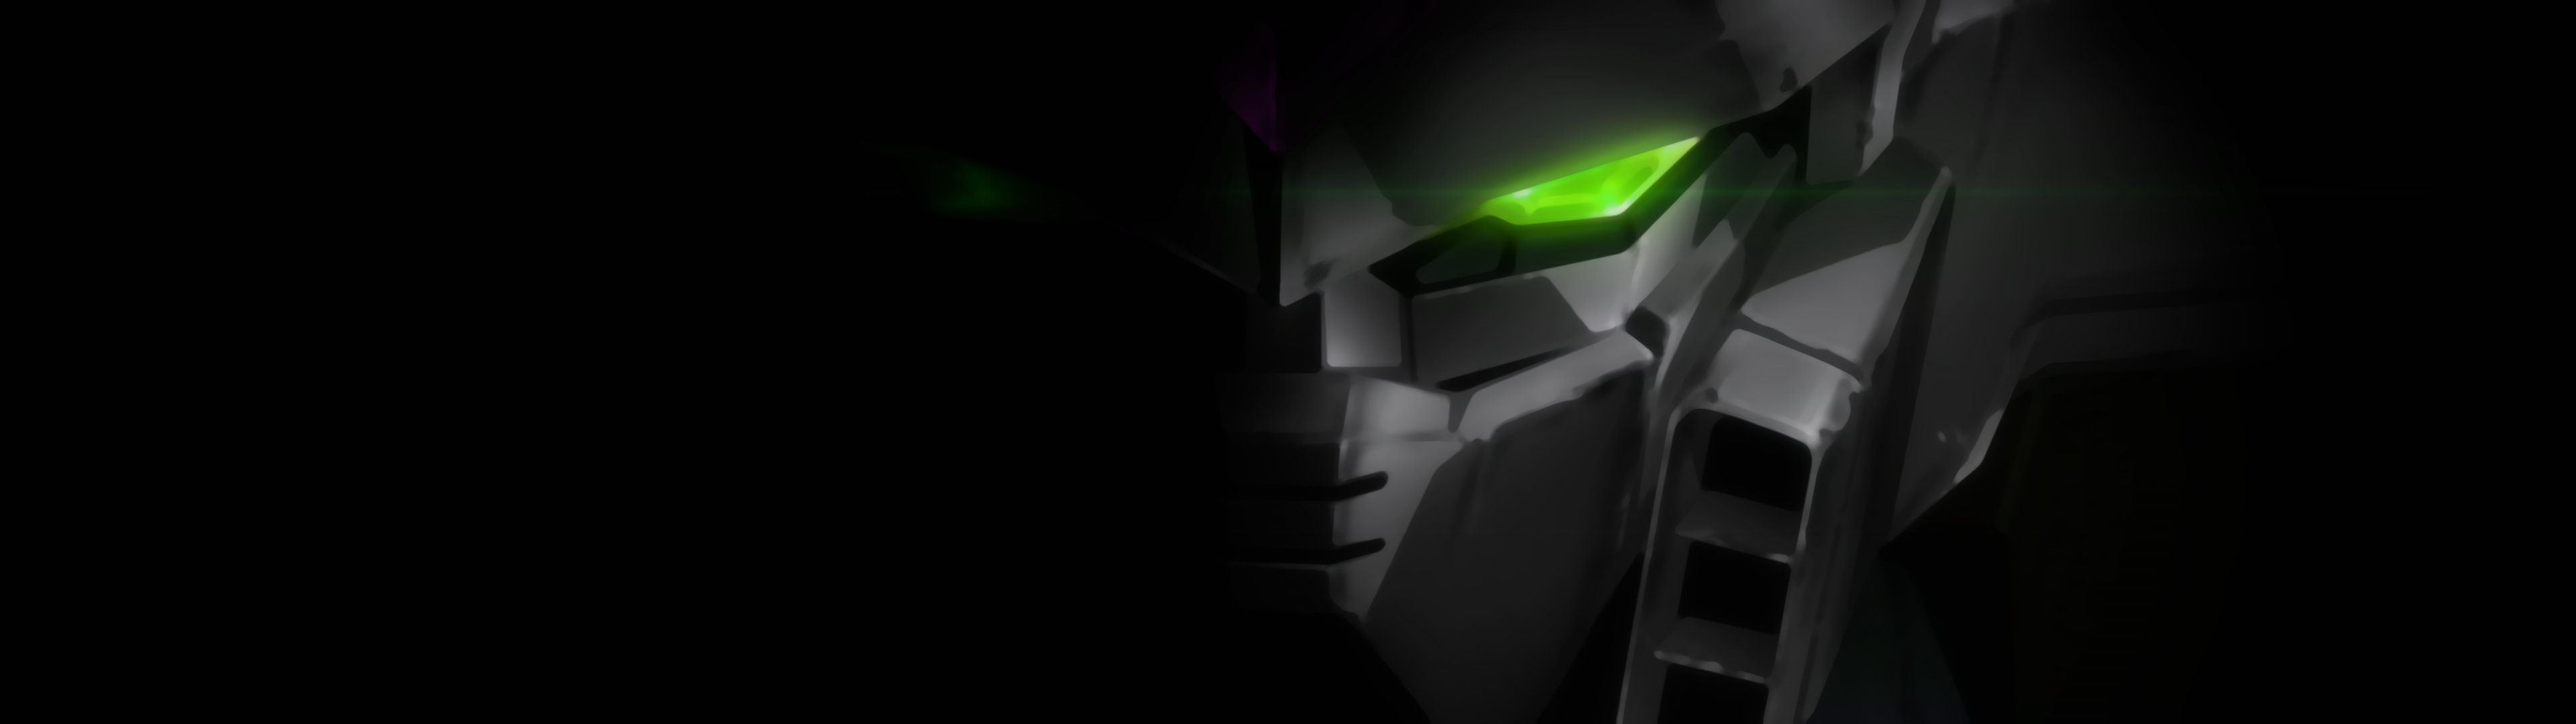 Gundam Dual Monitor Wallpapers Top Free Gundam Dual Monitor Backgrounds Wallpaperaccess